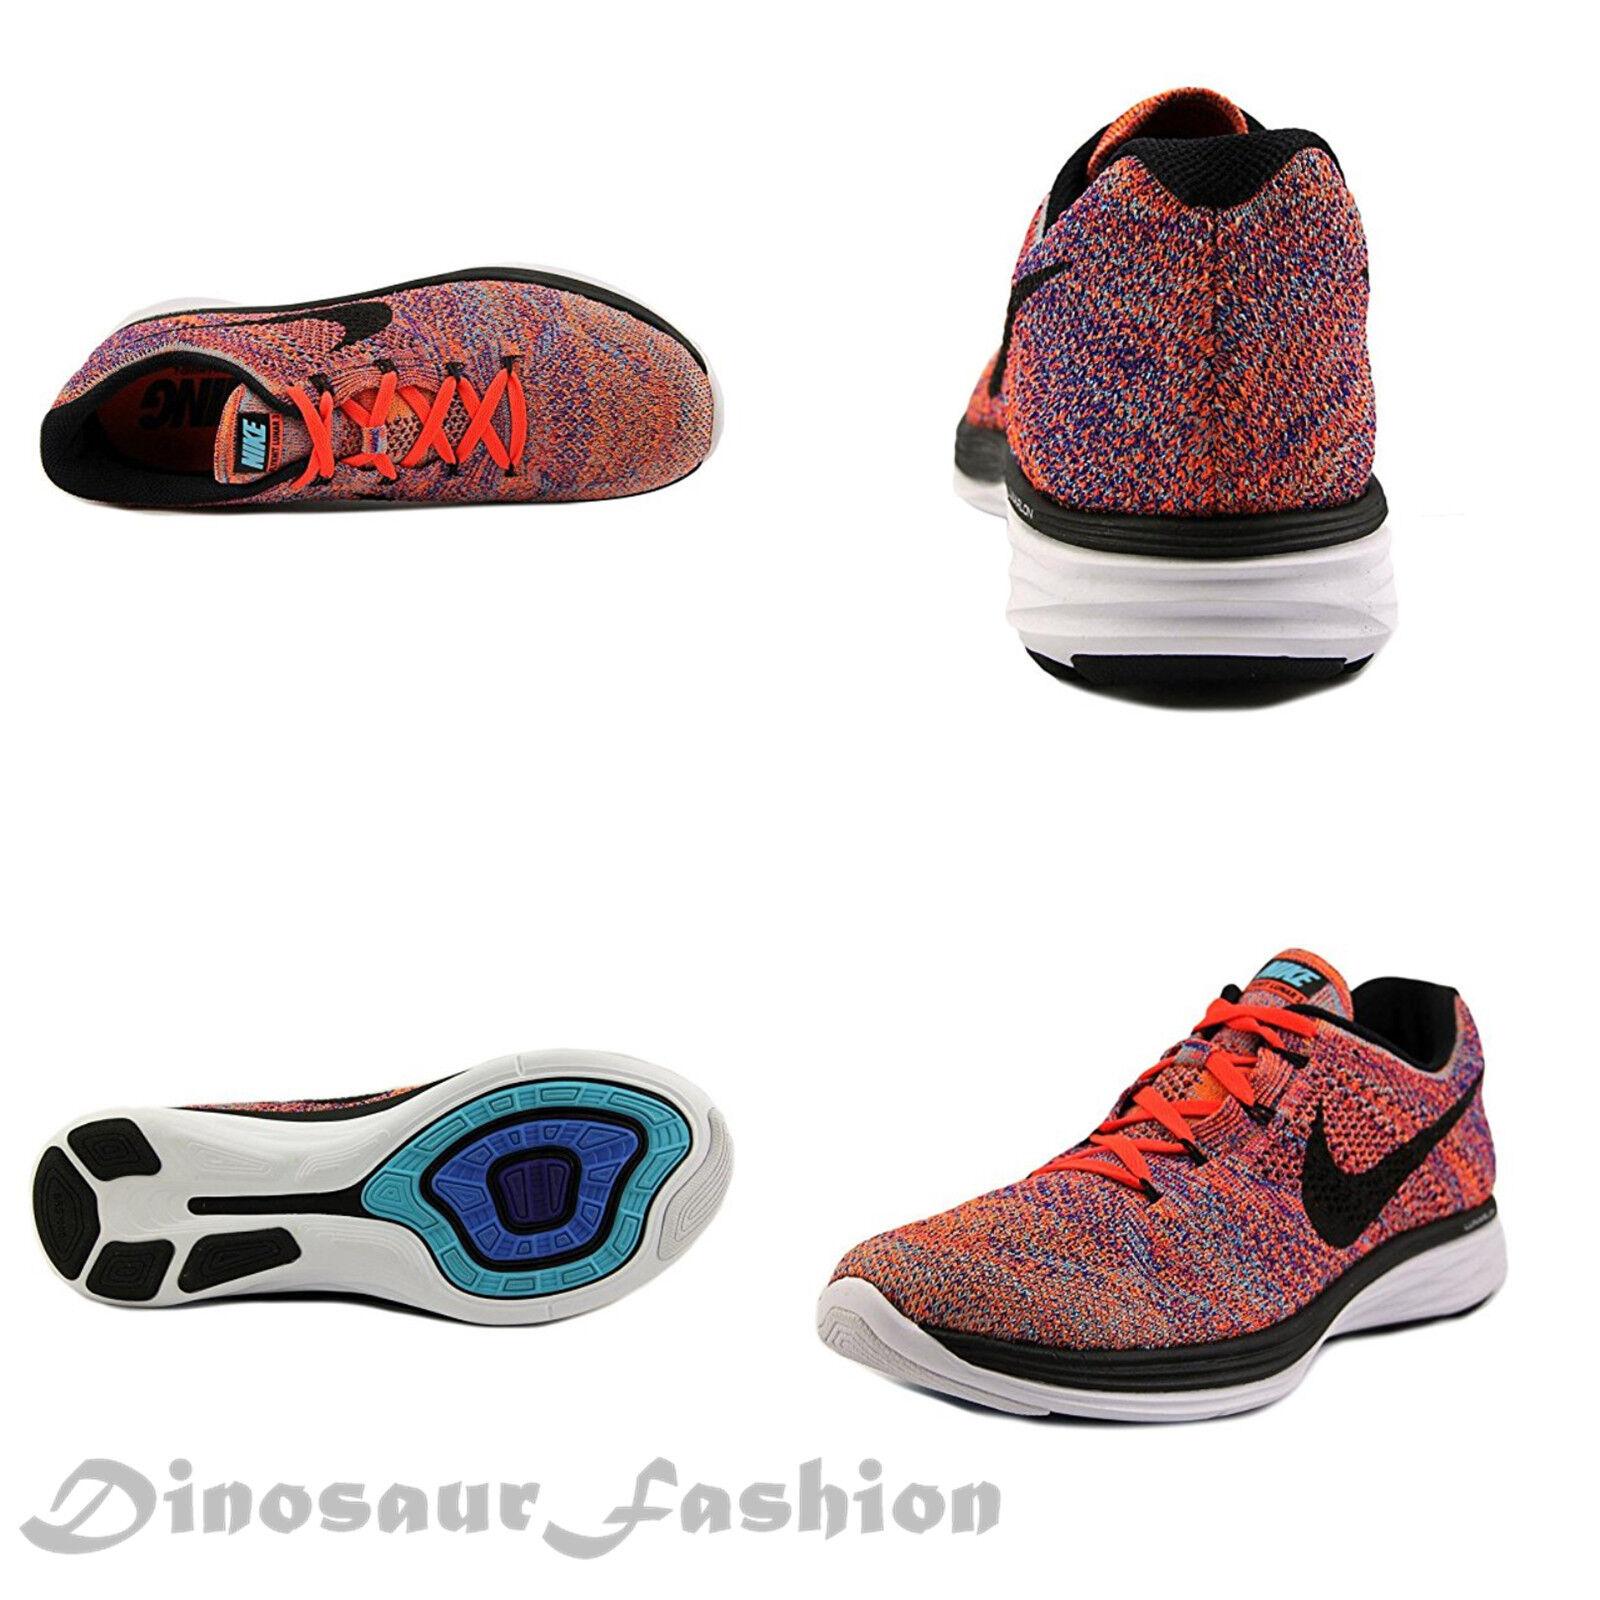 nike flyknit est lunar3 < 698181-406 > hommes est flyknit running-Basket s avec boîte de chaussures, 5be69f